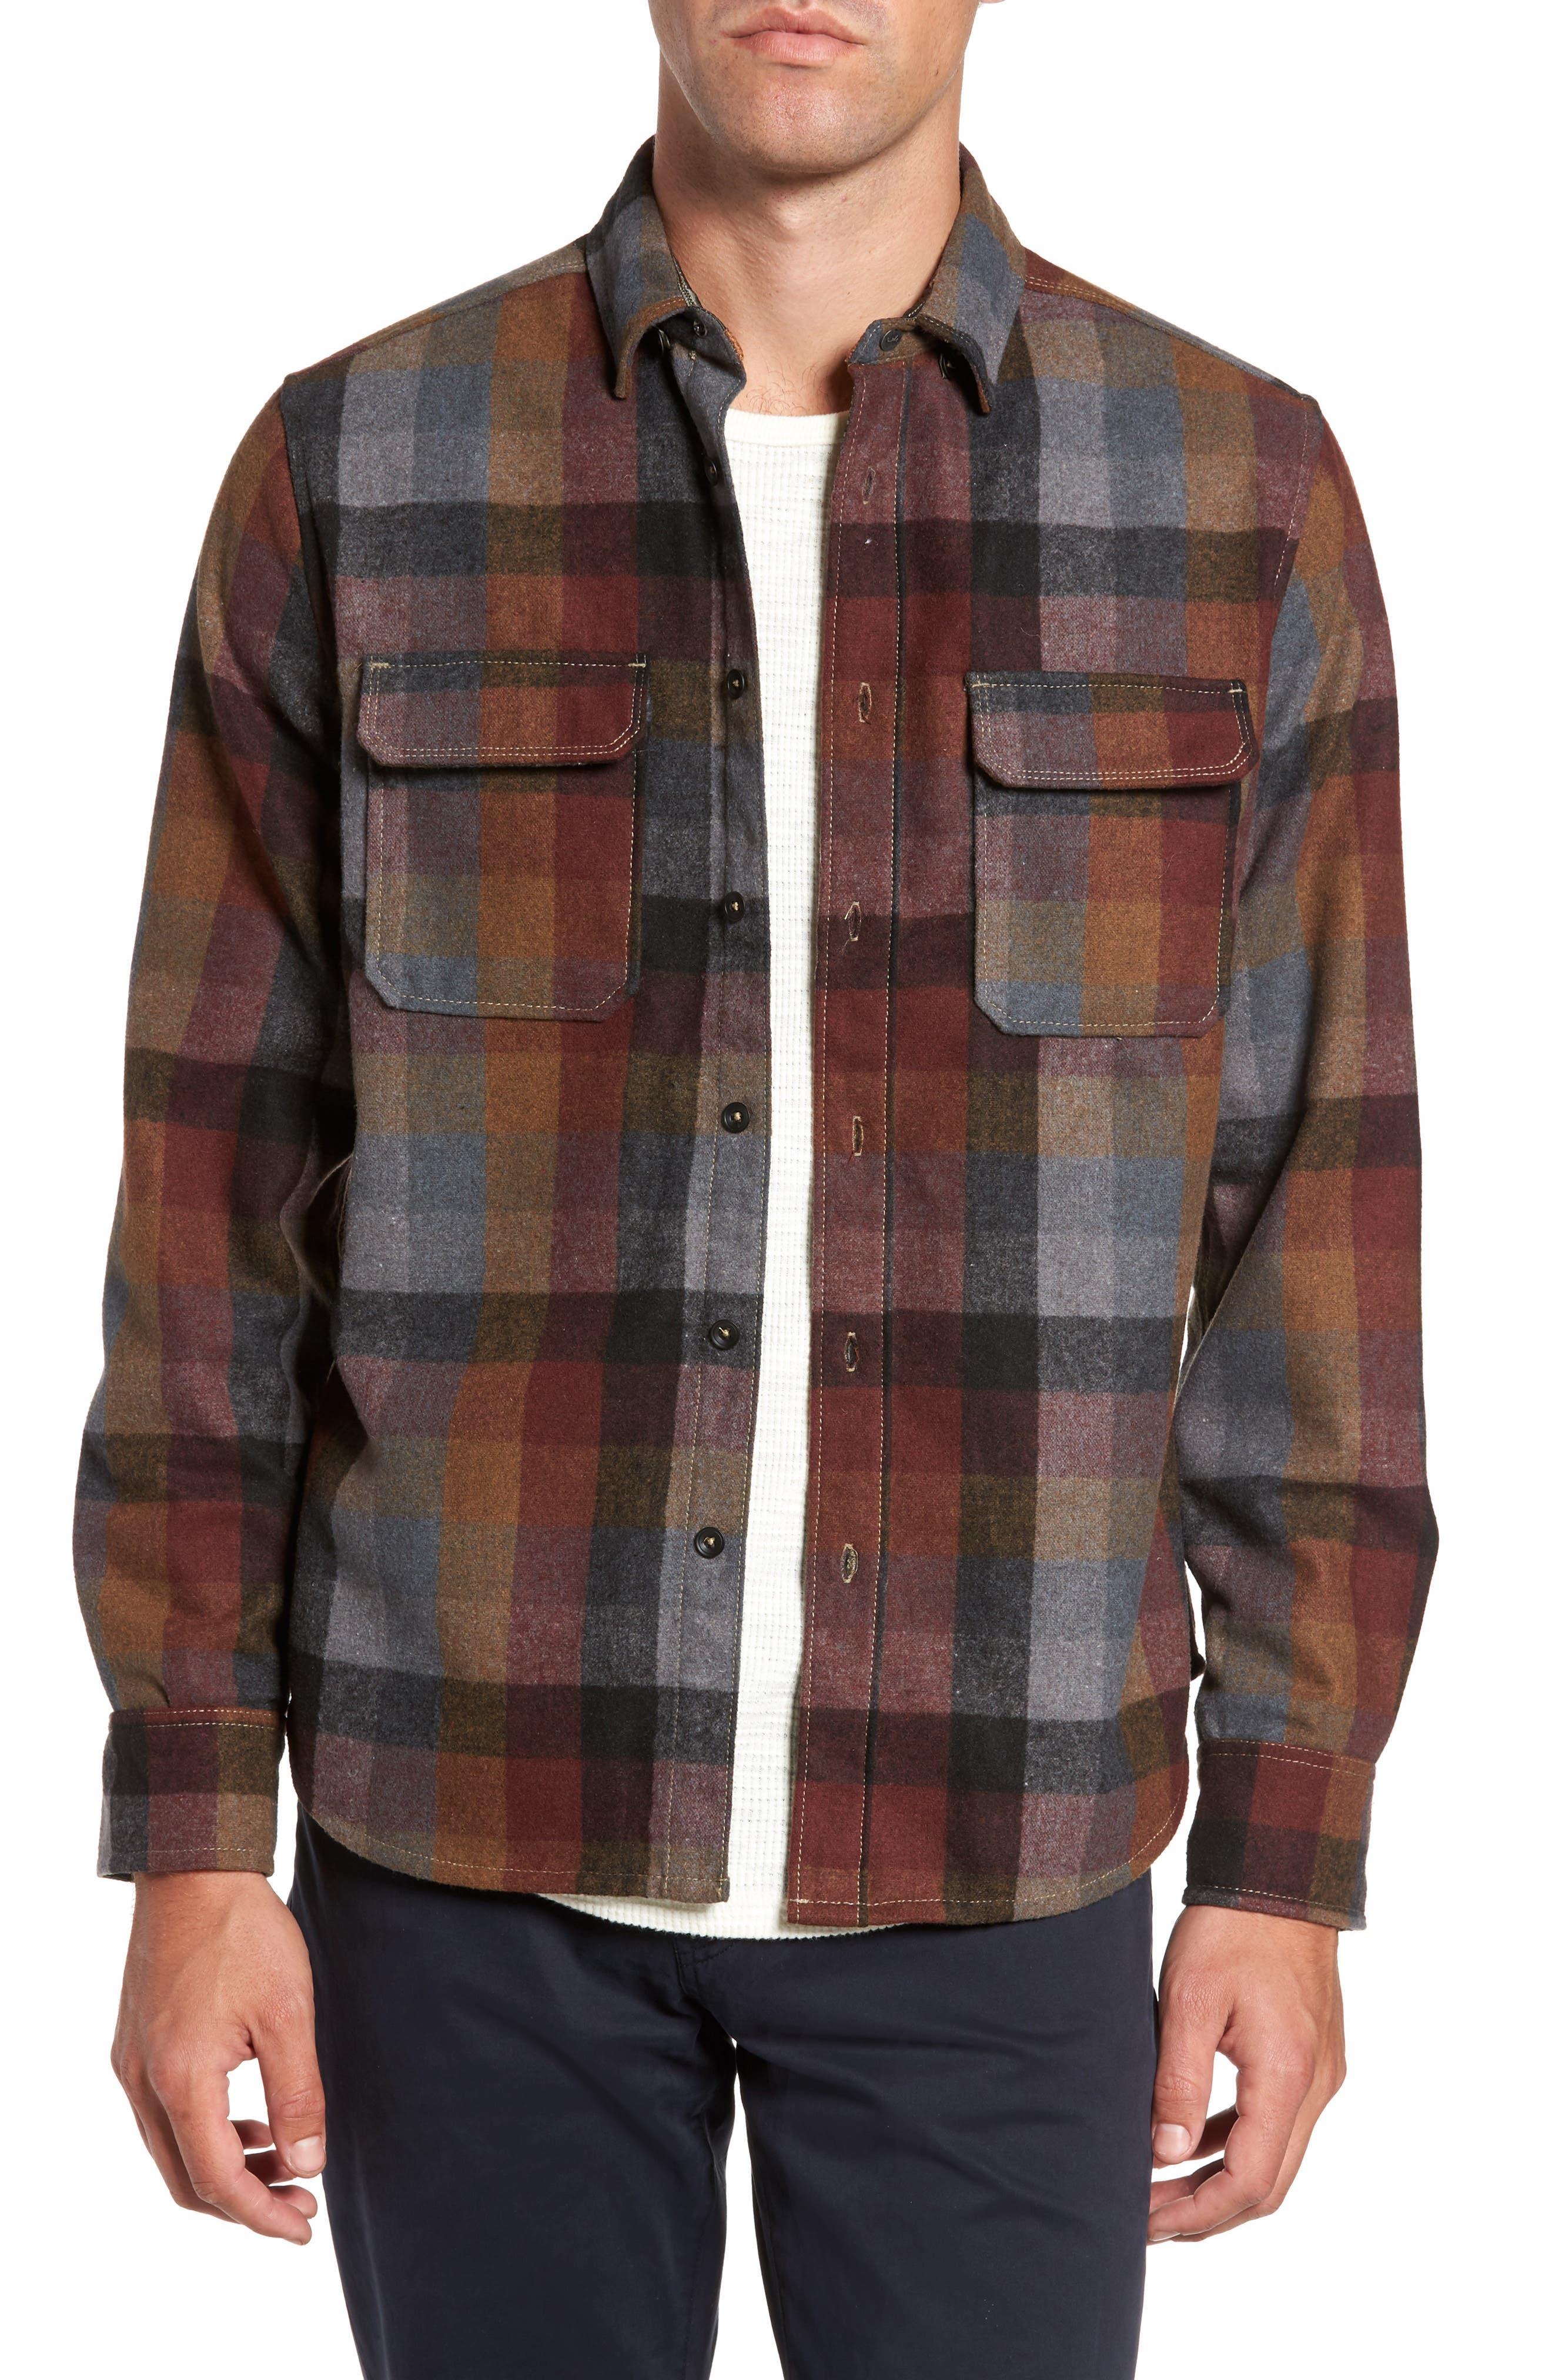 Jeremiah Heath Brushed Flannel Shirt